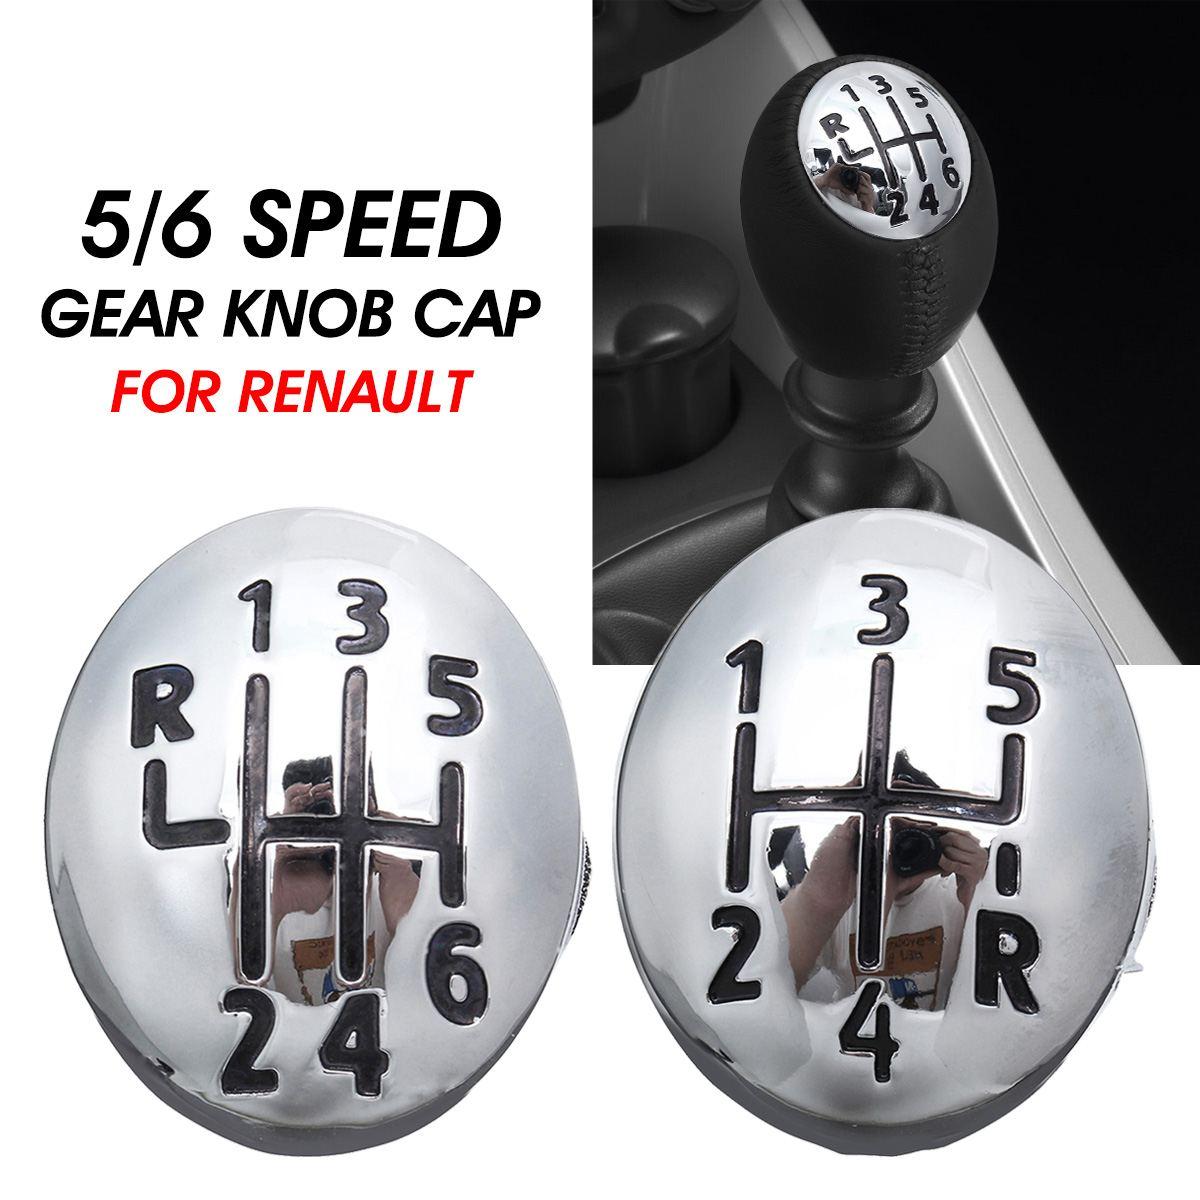 Chrome 5/6 Speed Gear Shift Lever Knob Cap Cover For Renault Clio Megane Scenic Twingo Plastic Auto Car